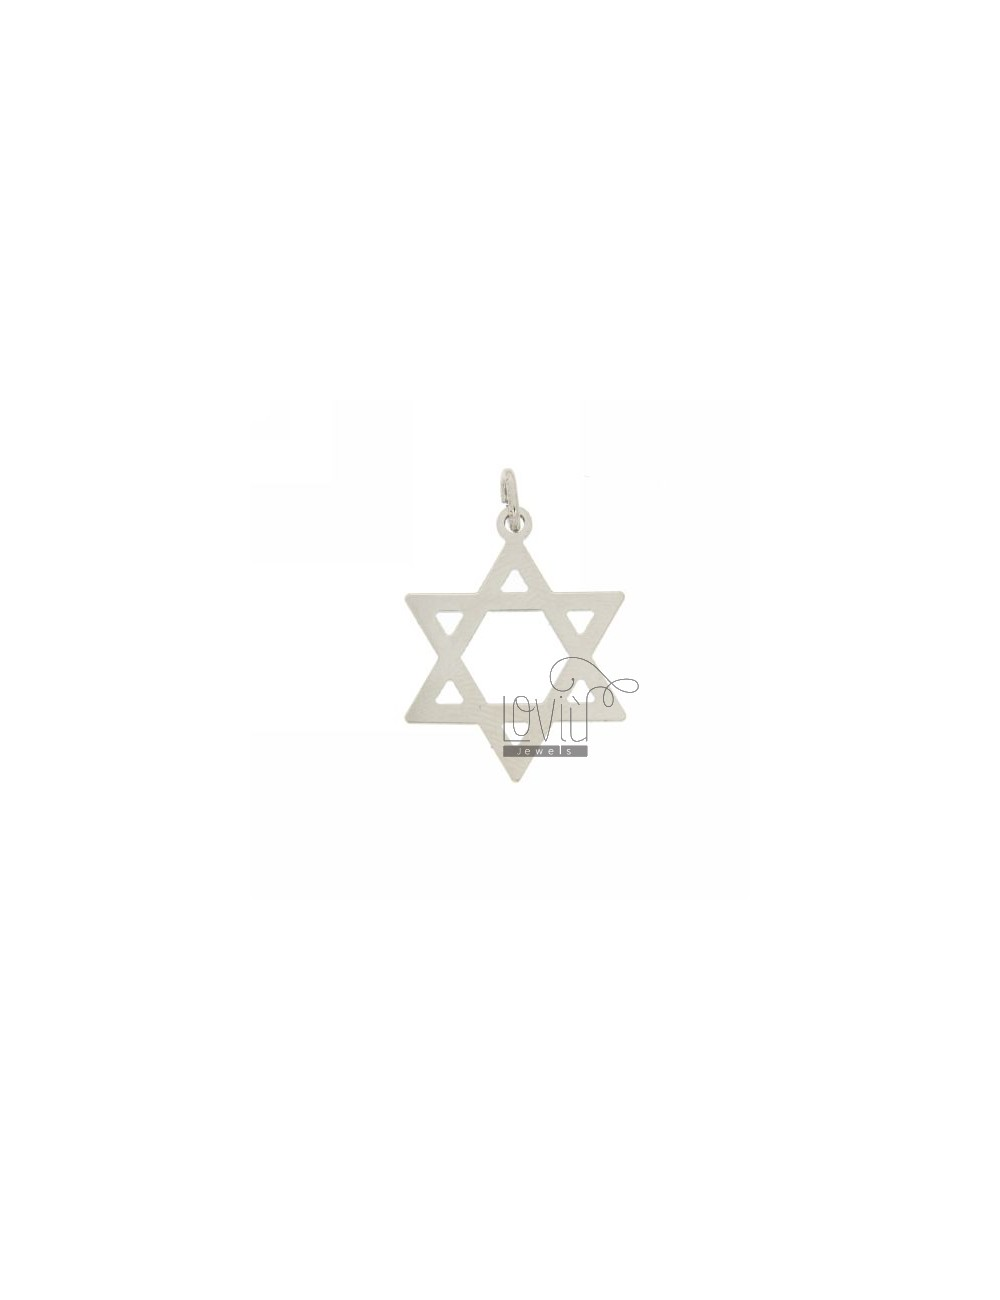 STAR OF DAVID PENDANT LASER CUTTING IN SILVER RHODIUM 925 ‰